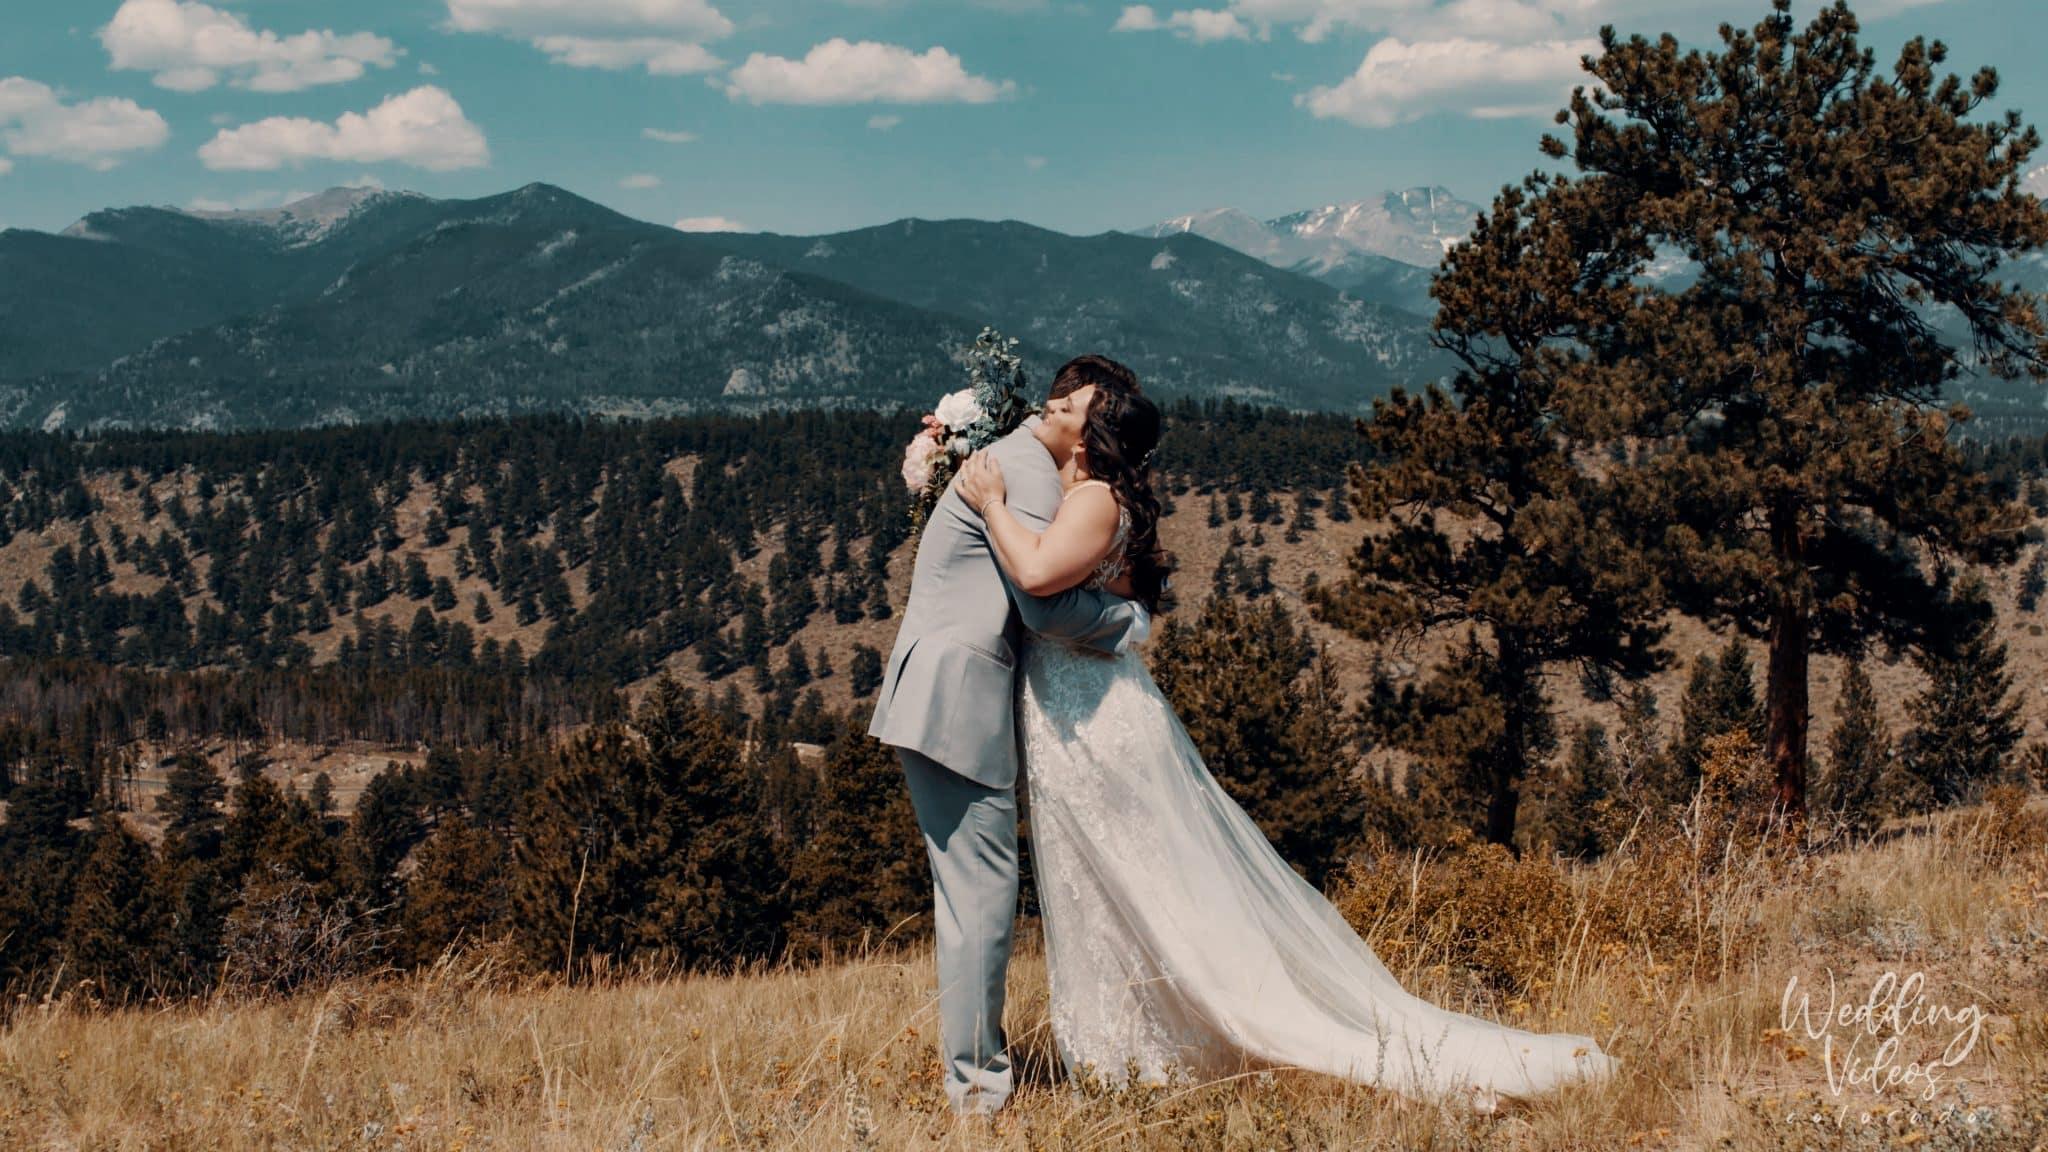 Lance Ashley YMCA of the Rockies, Estes Park, Mountain Wedding